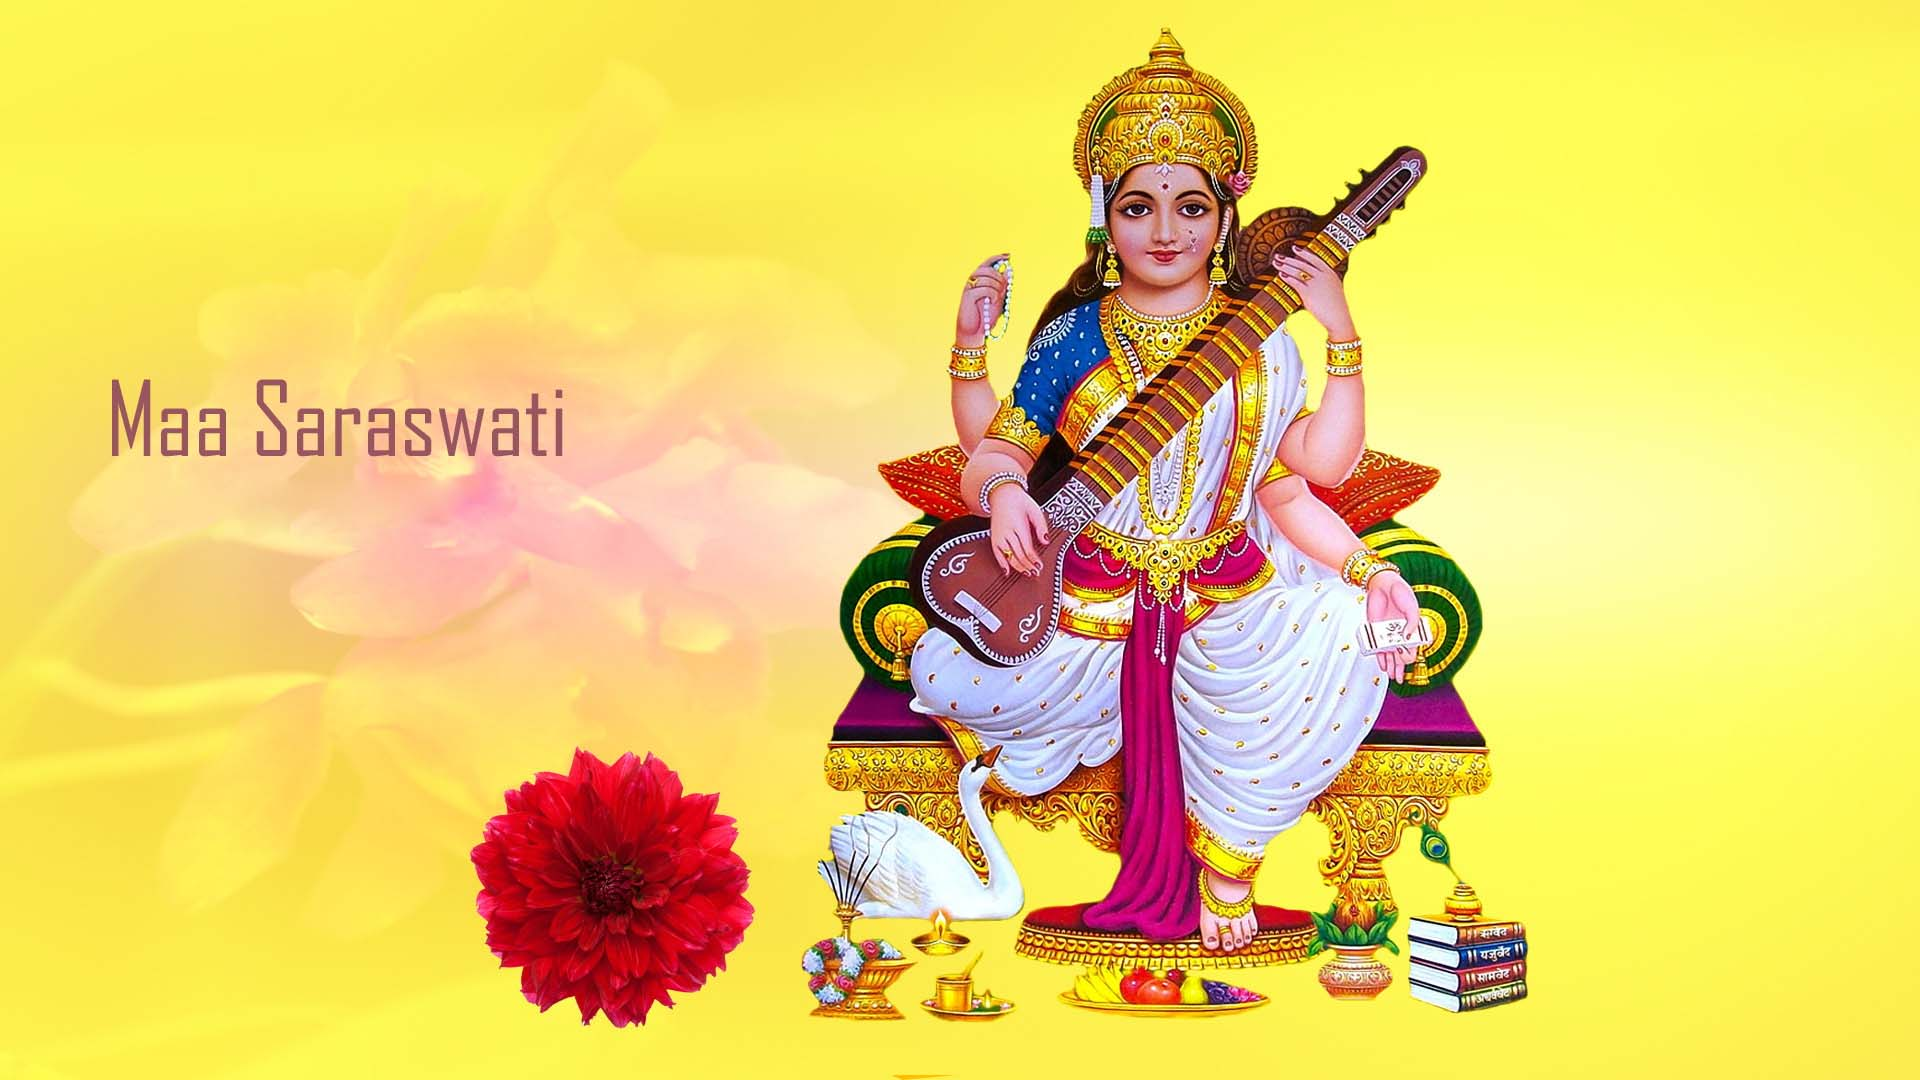 Maa Saraswati 3d Wallpaper New